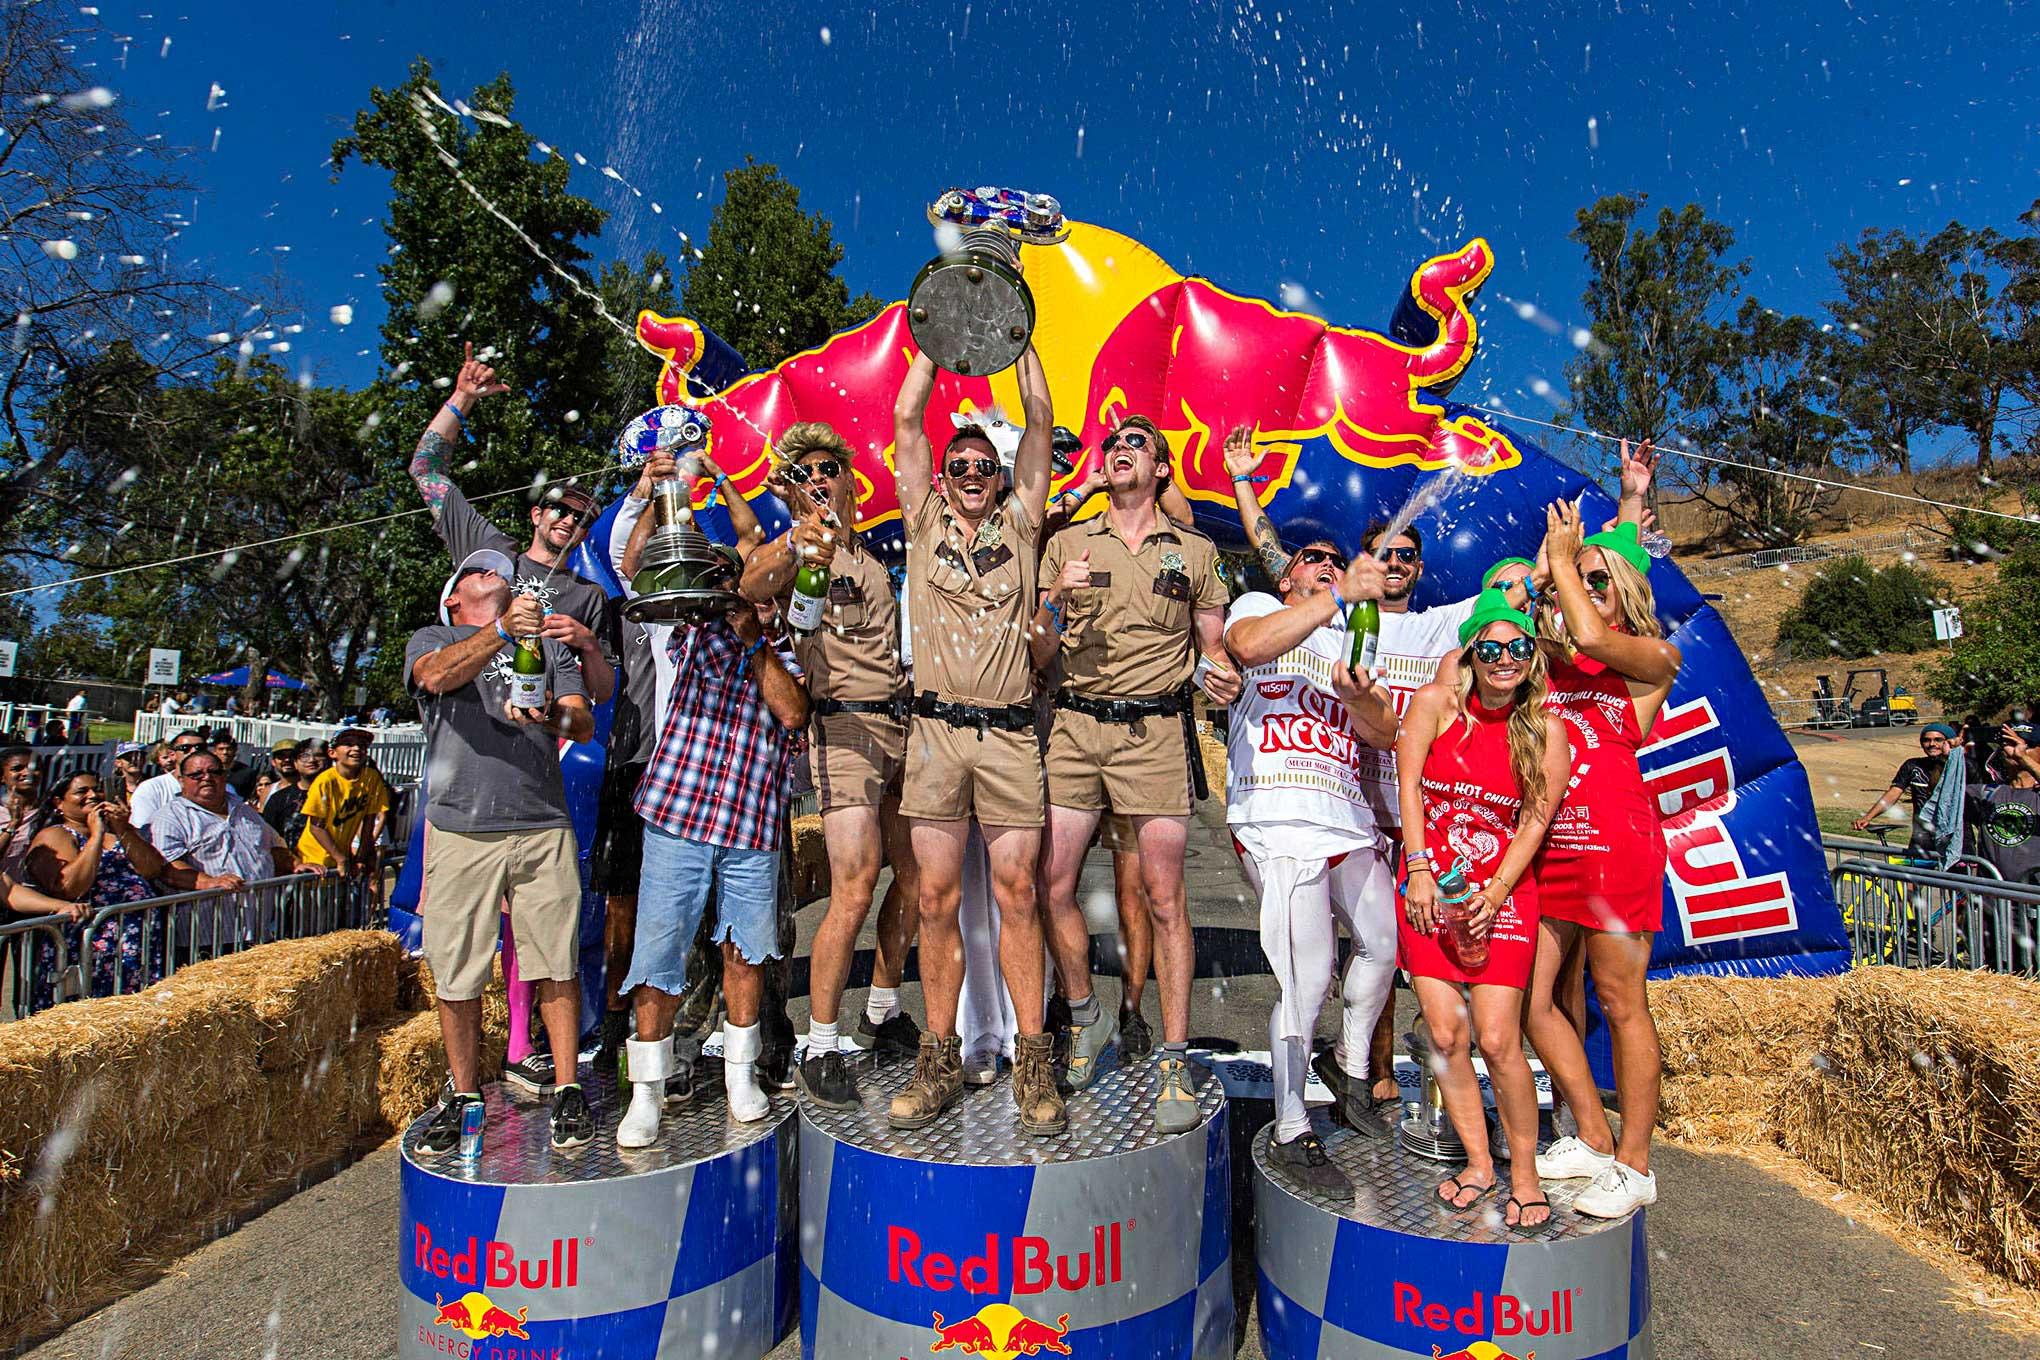 RED BULL SOAPBOX - Red Bull Soapbox Races